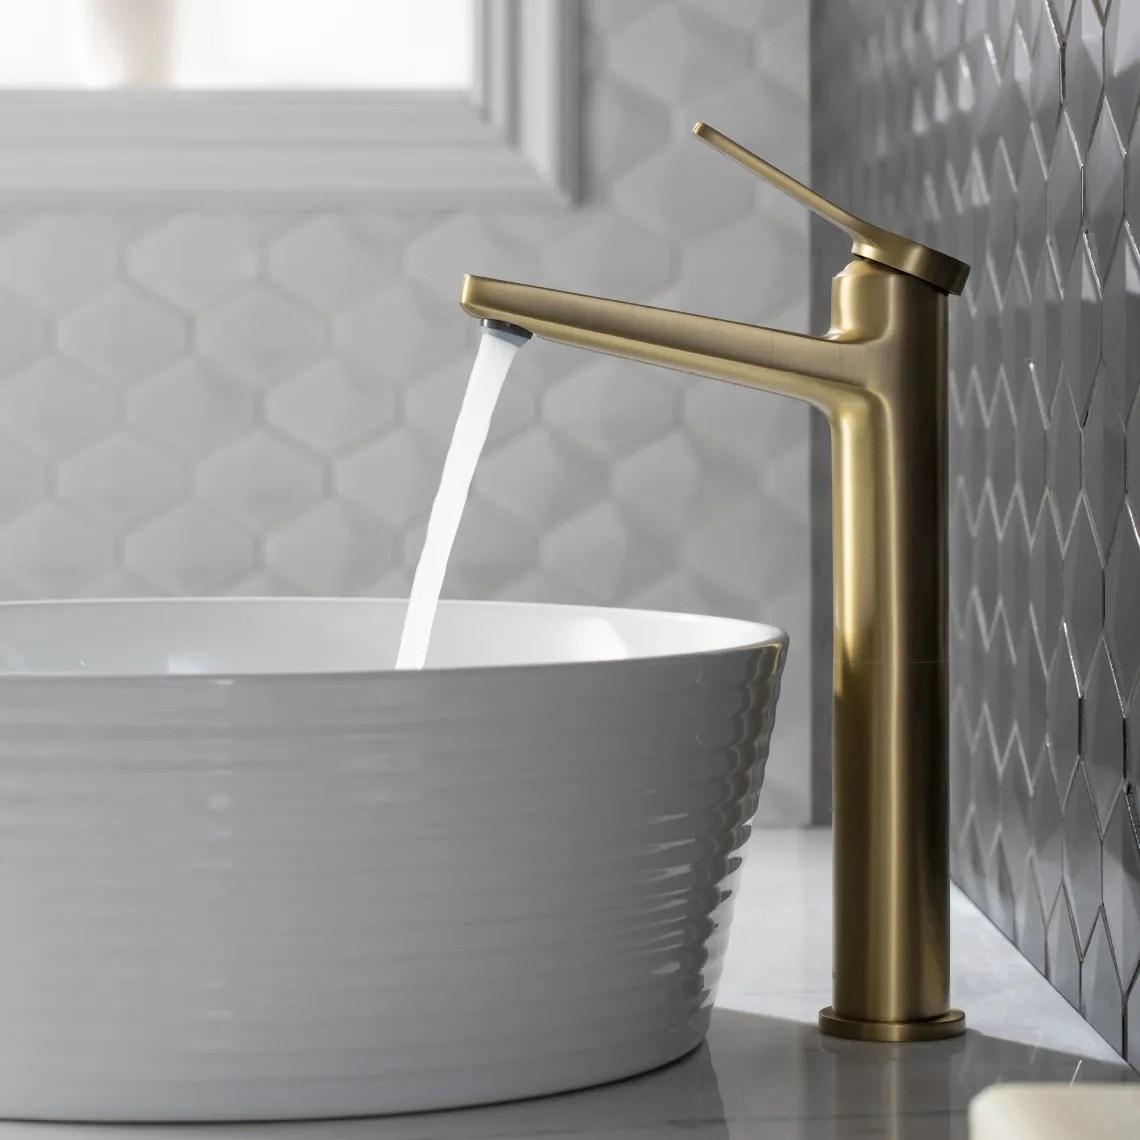 value kitchen and bathroom upgrades